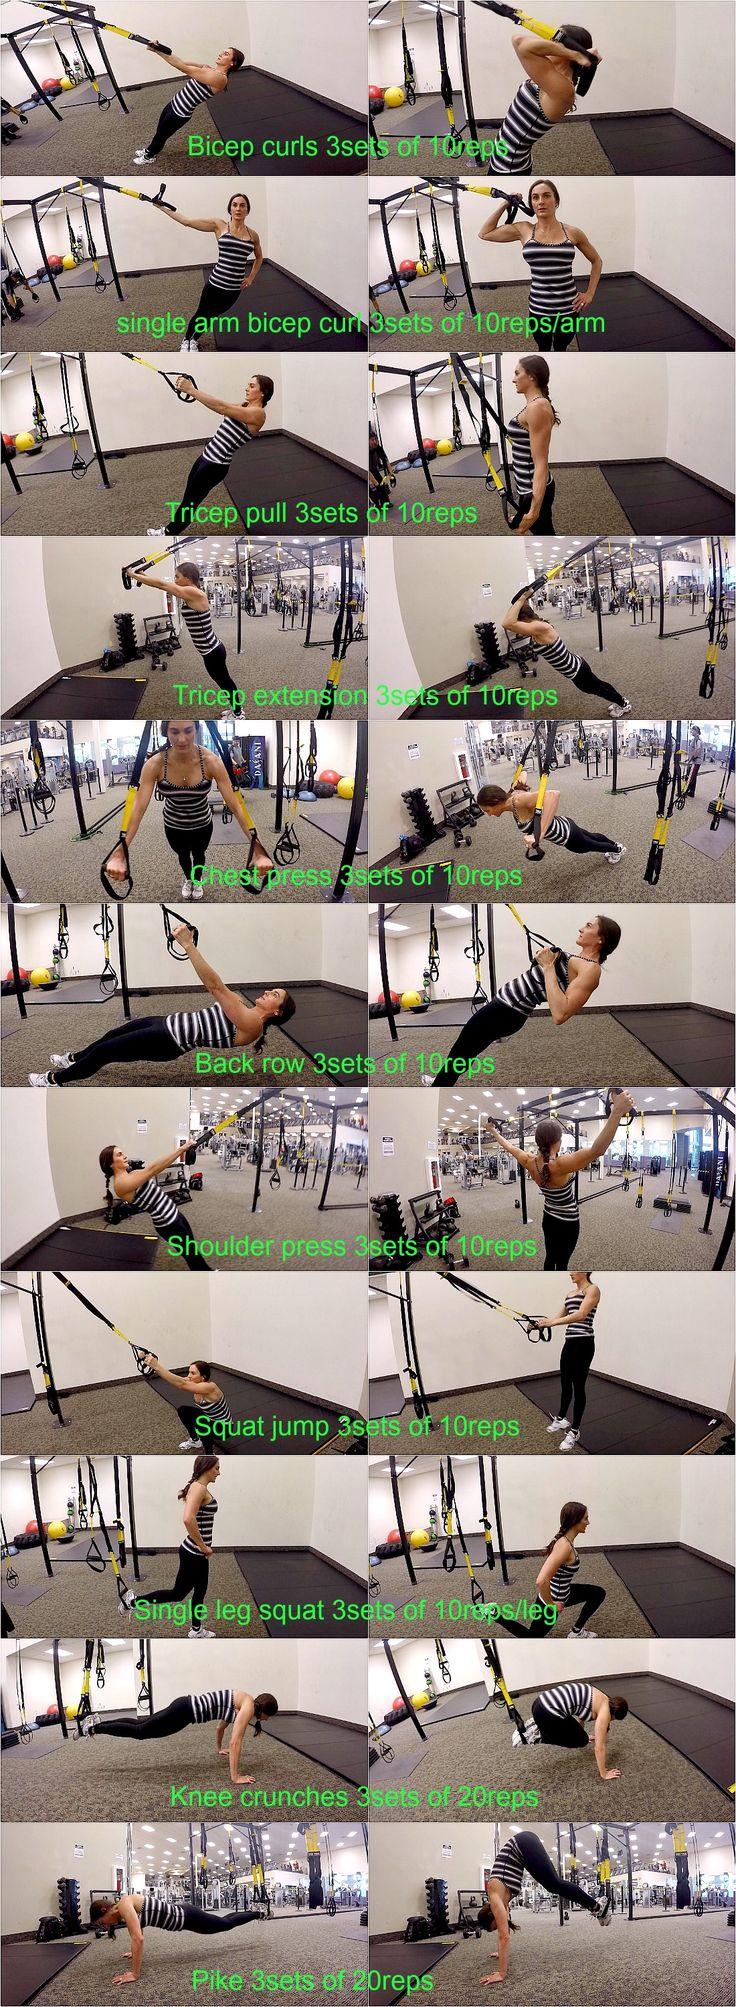 10 Weeks To Fitness-Day 47: Active Rest TRX - http://www.amazon.de/dp/B00RLH0M6C http://www.amazon.co.uk/dp/B00RLH0M6C